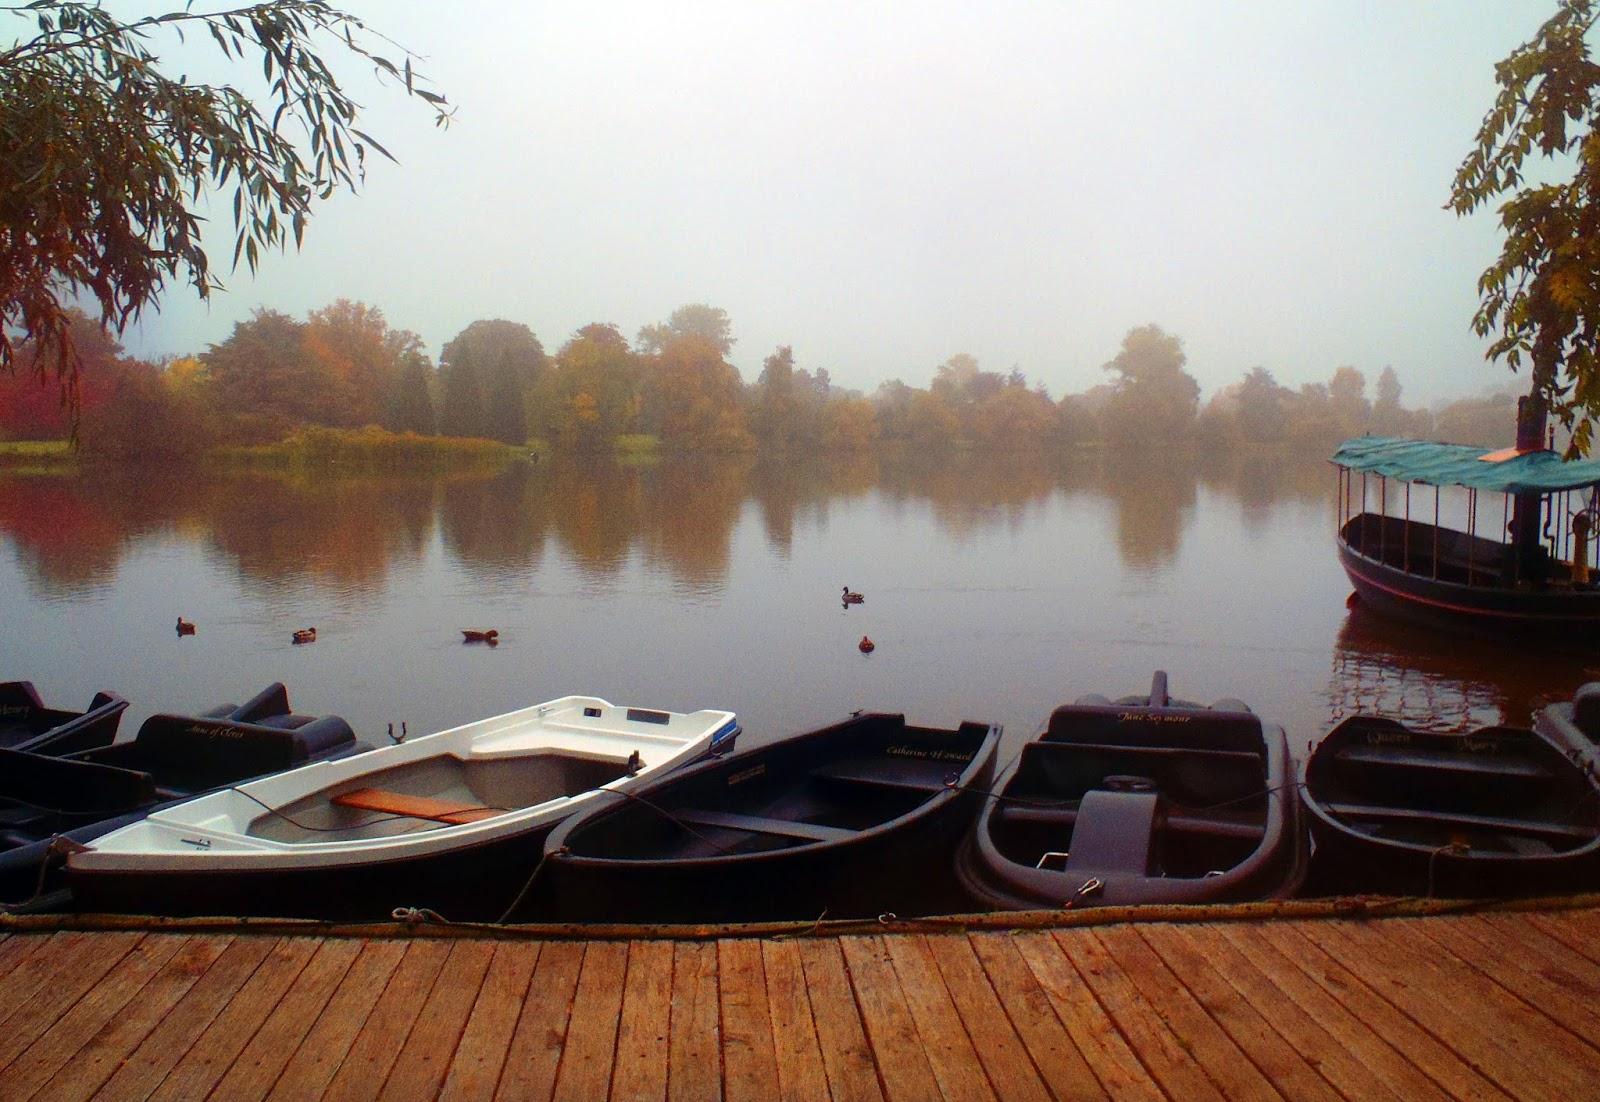 Mist over lake at Hever Castle